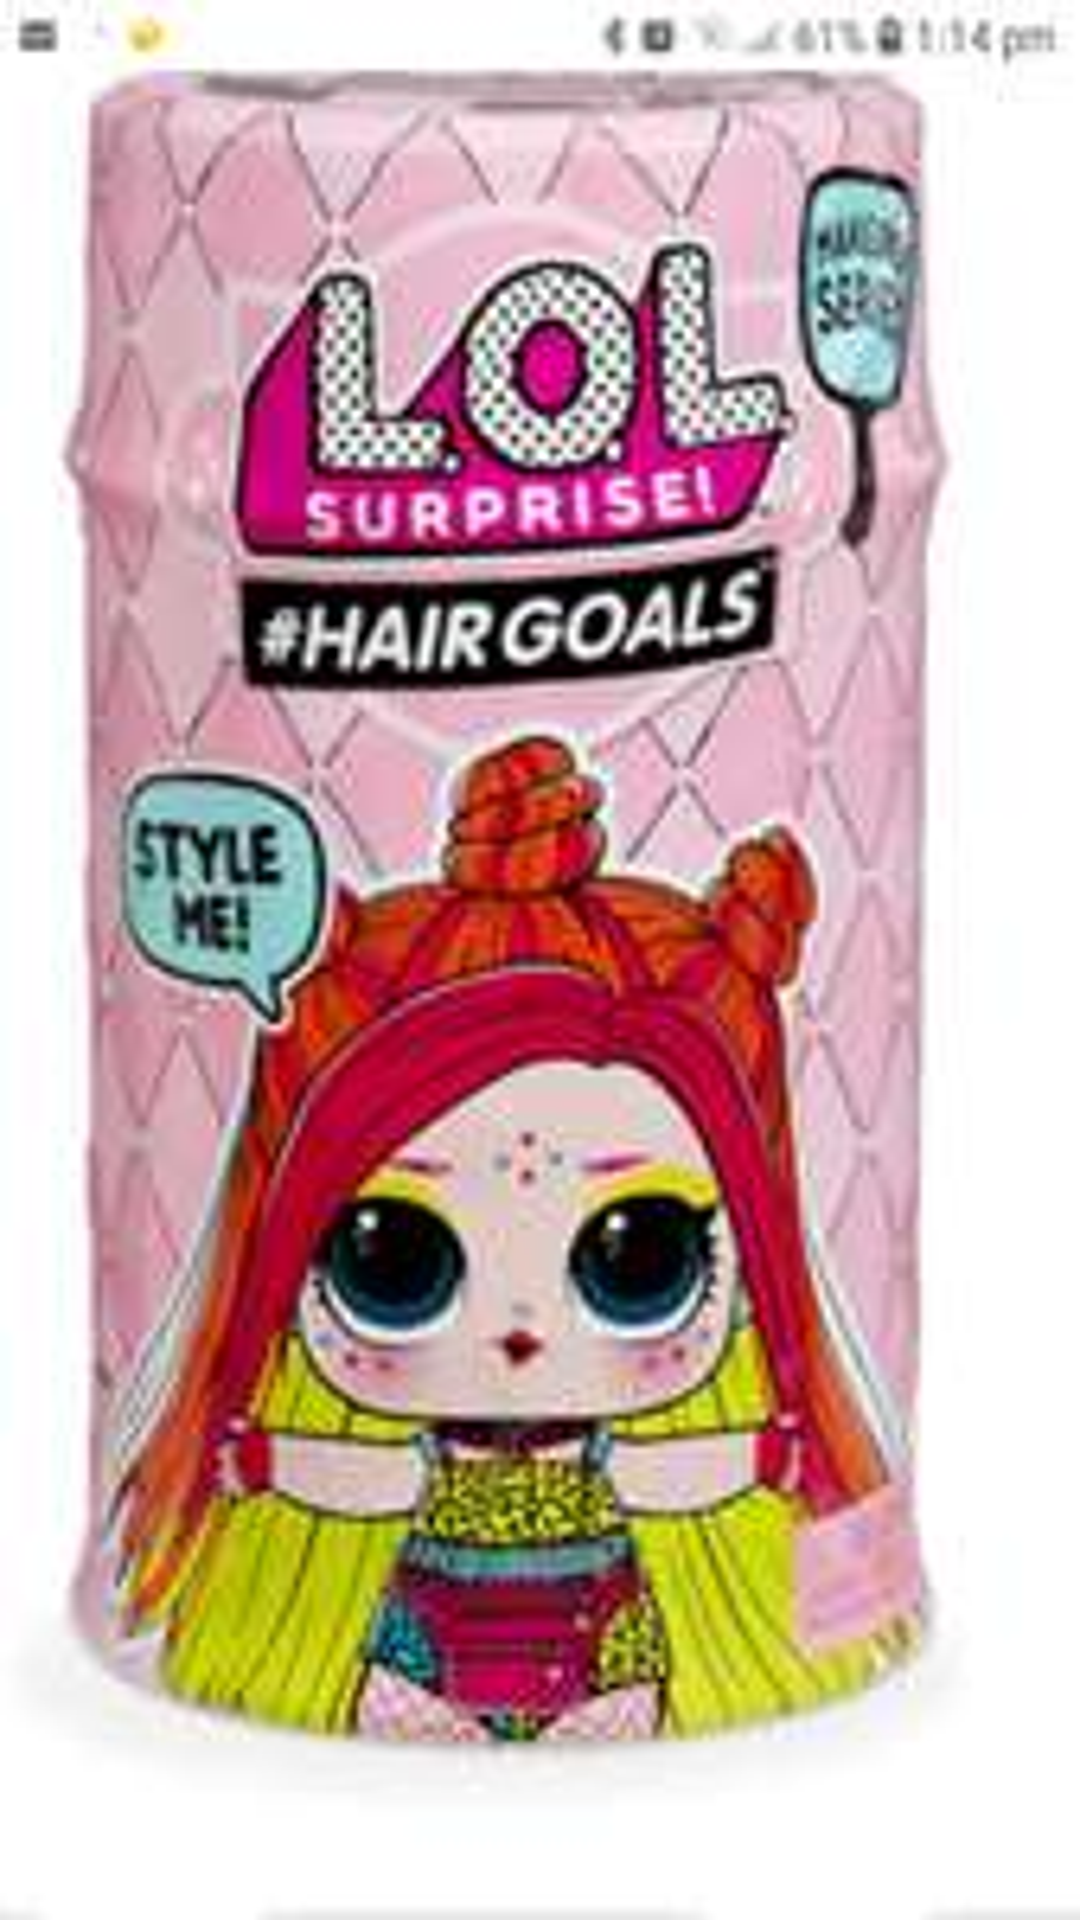 Lol Hair goals series 2 - £10 instore @ ASDA